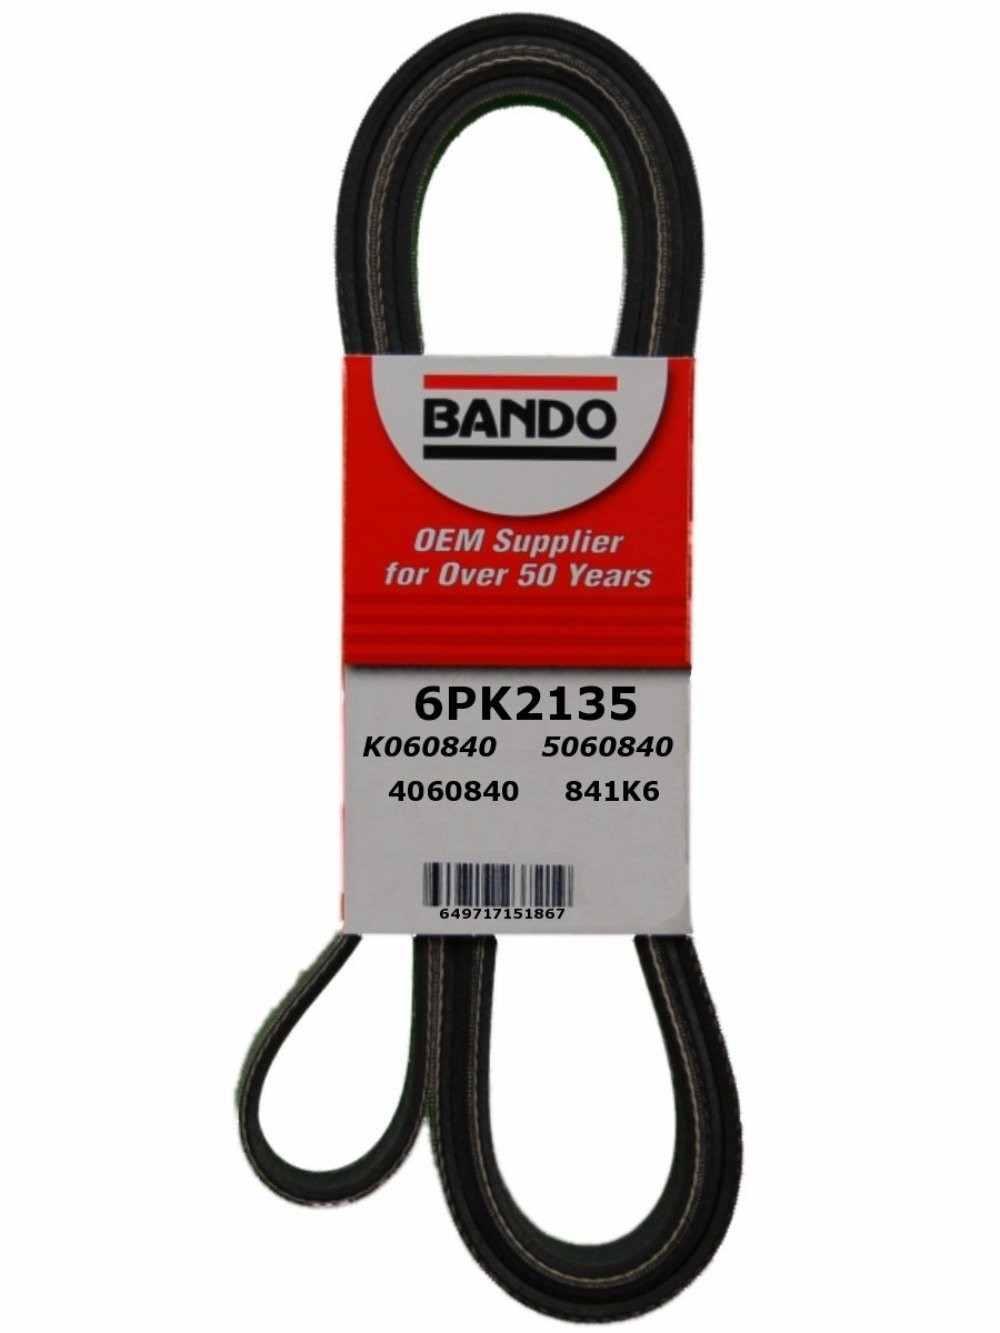 BANDO - Serpentine Belt (Water Pump, Alternator, Air Conditioning and Power Steering) - BWO 6PK2135